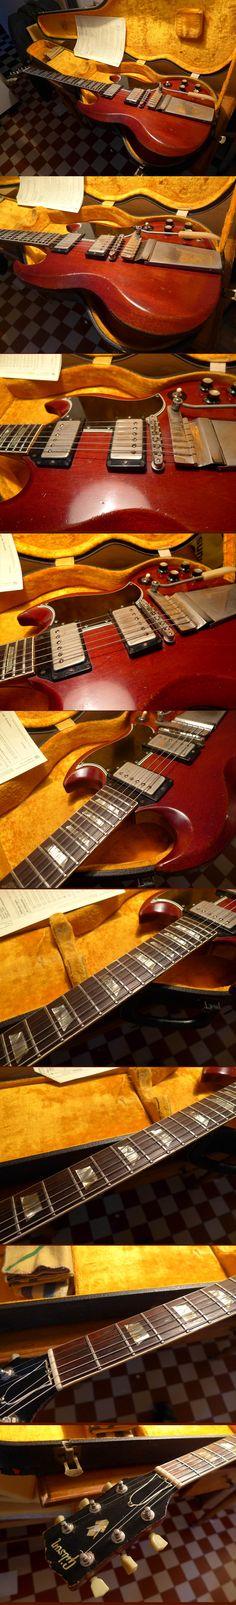 1964 Gibson SG Std